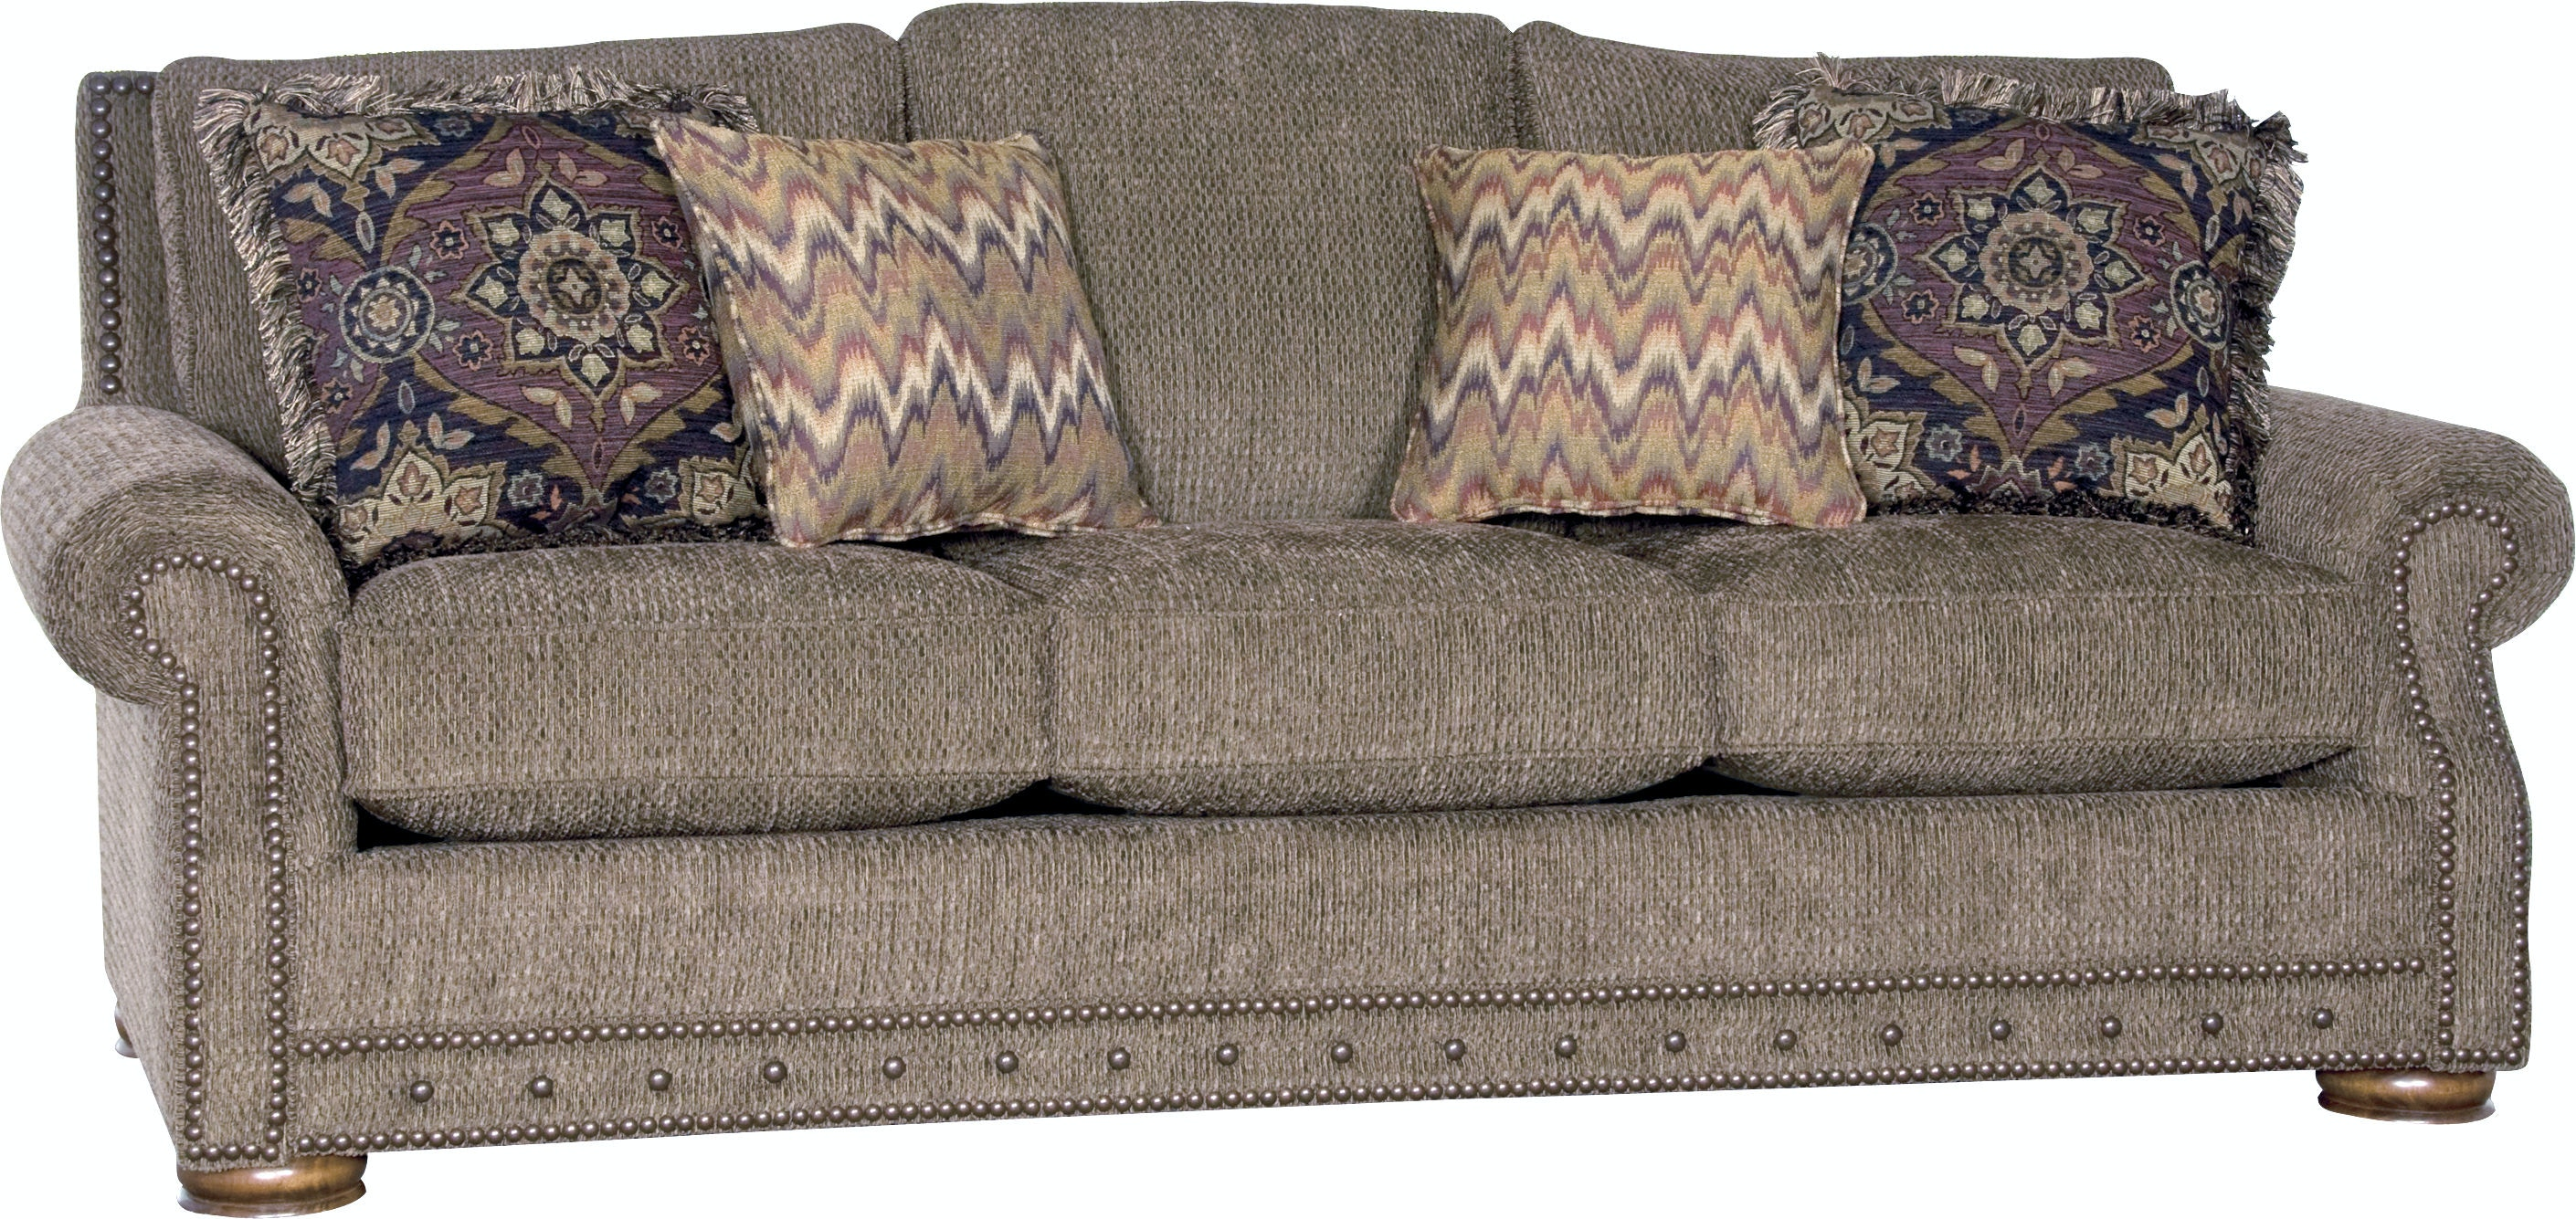 2900F10. Sofa